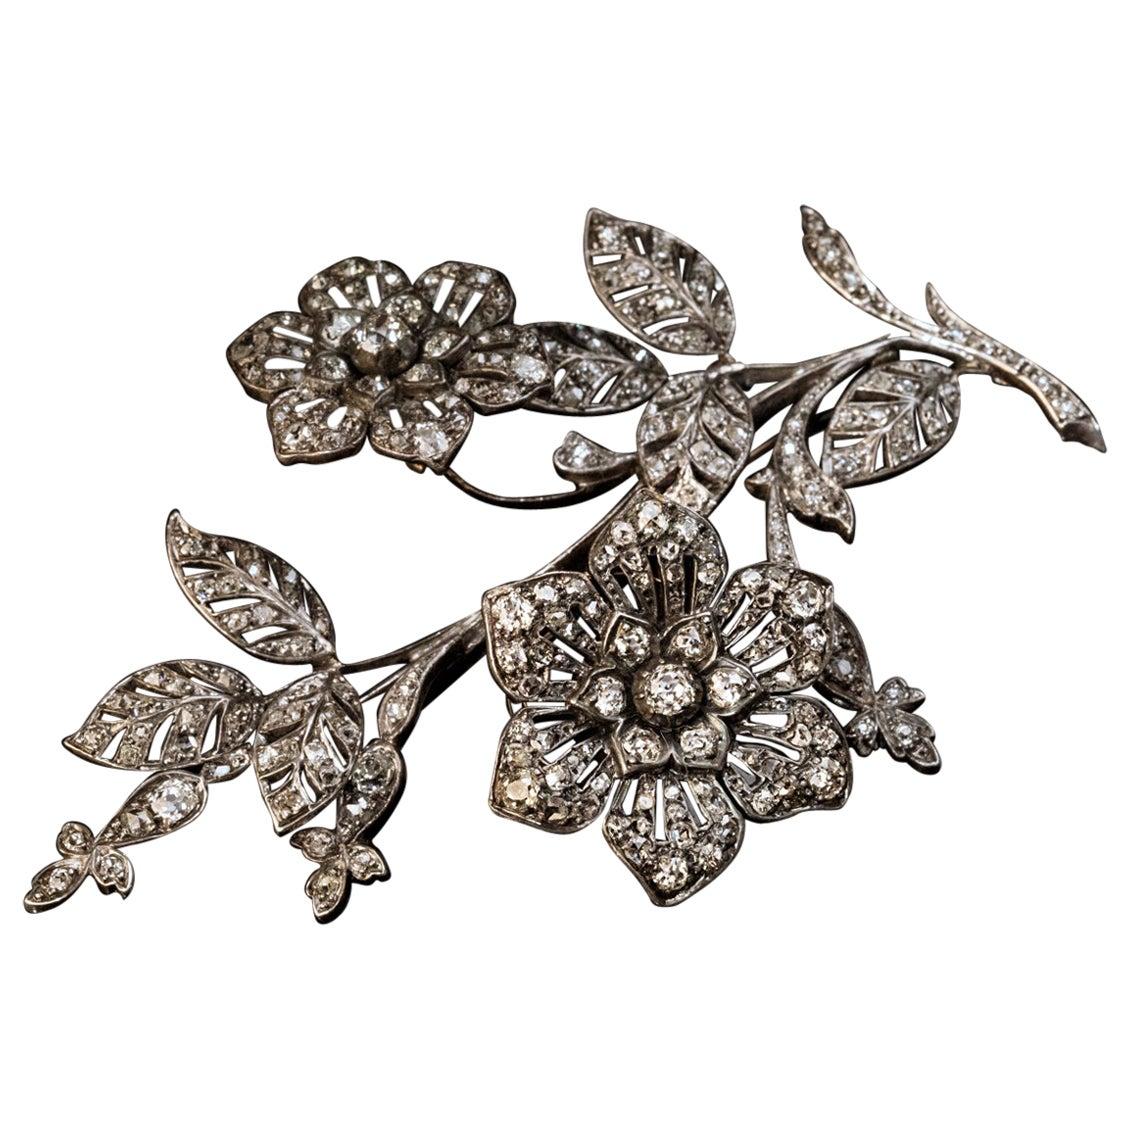 Very Large Antique 'En Tremblant' Diamond Brooch